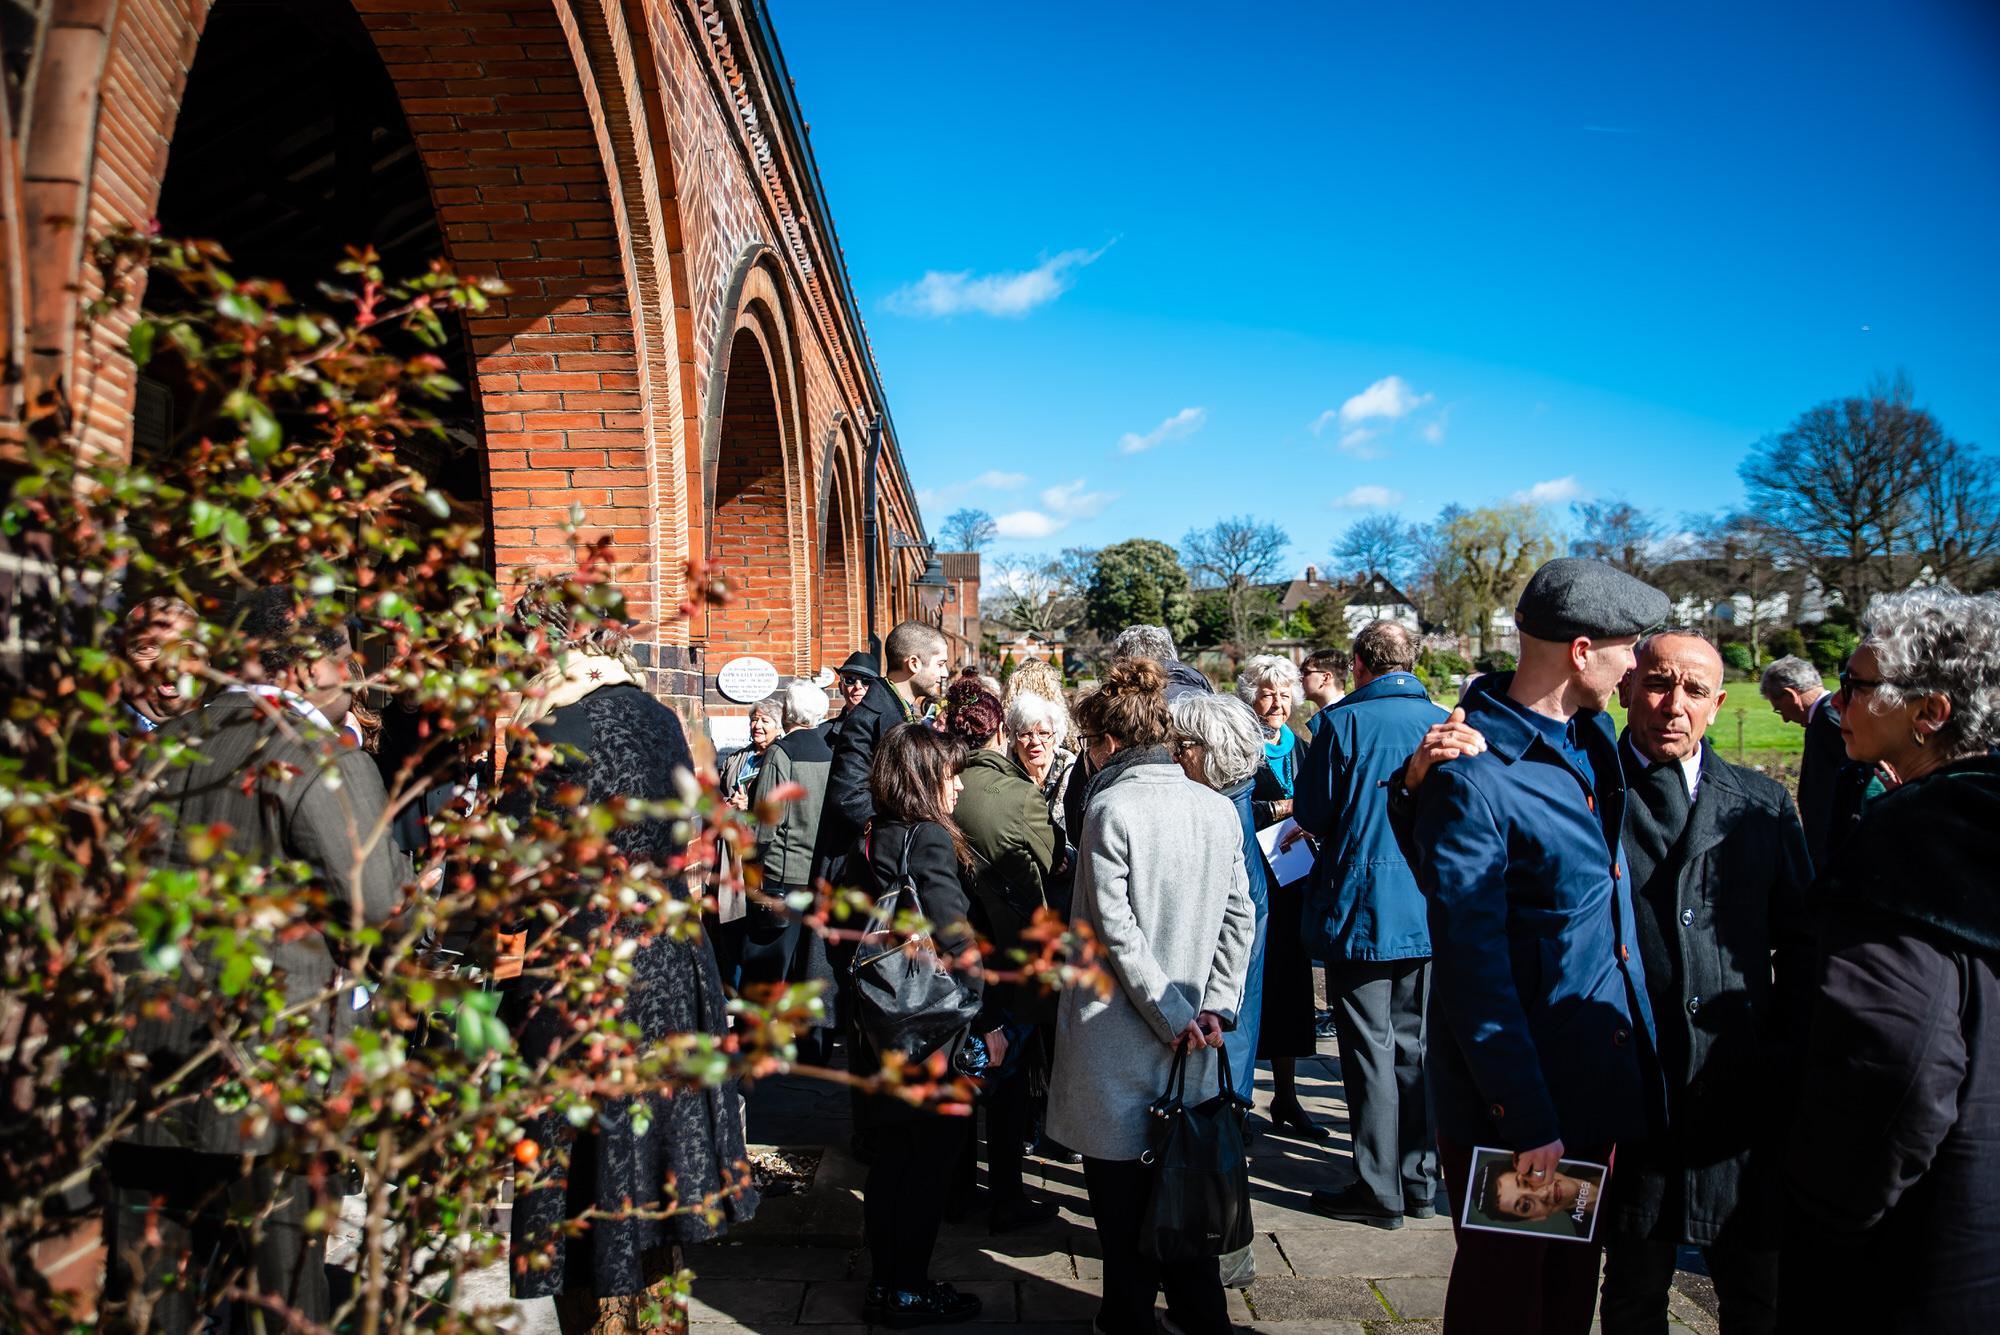 Funeral Photographer at Golders Green Crematorium in London